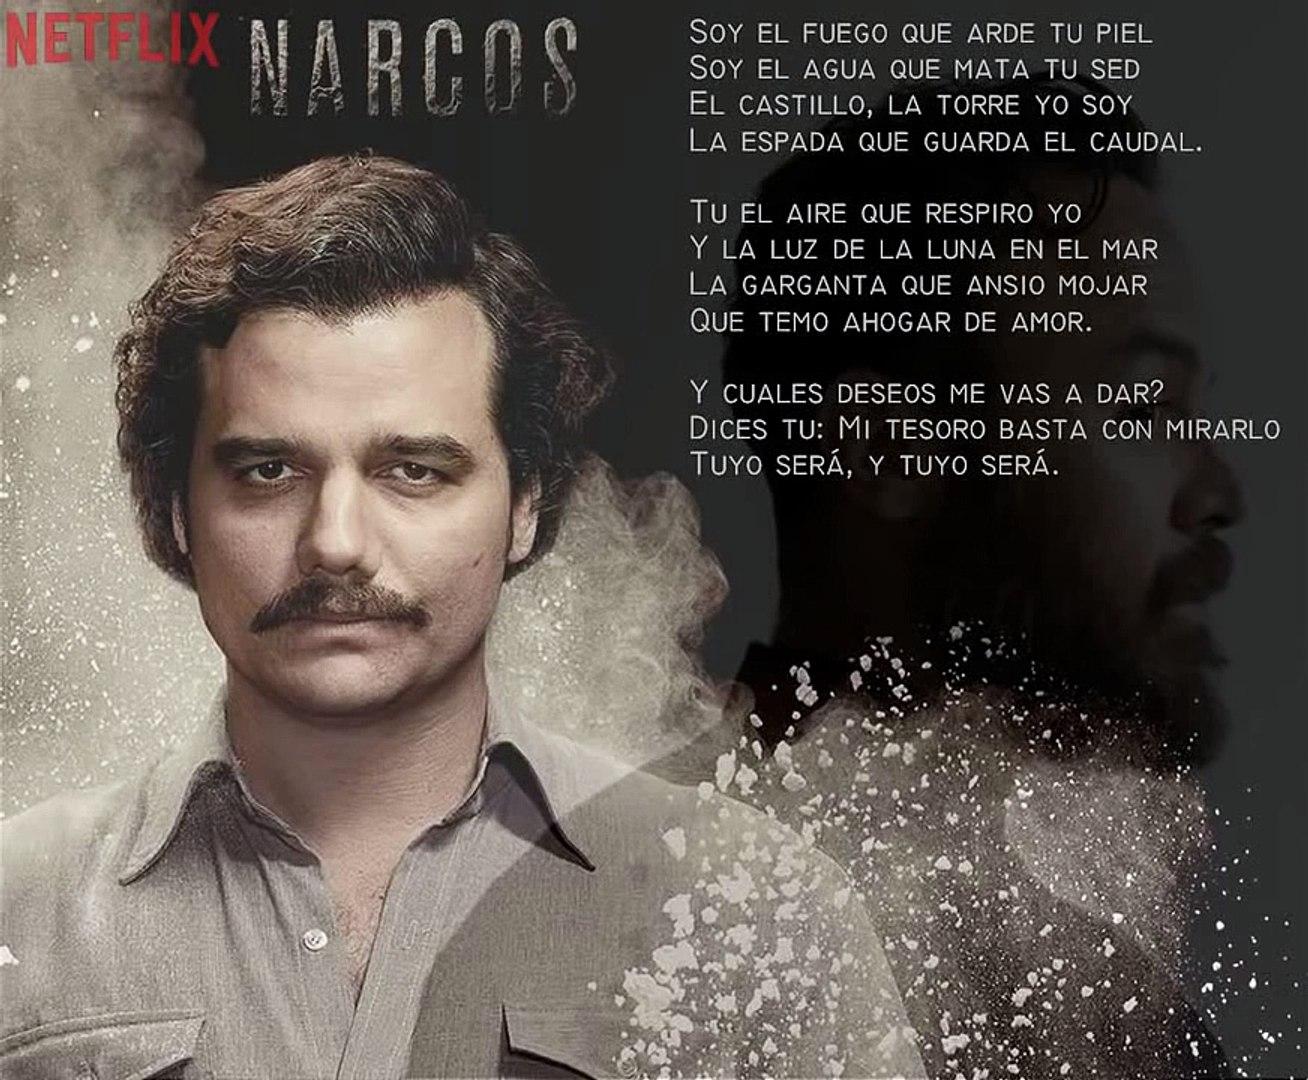 narcos opening song tuyo by rodrigo amarante lyrics esp eng